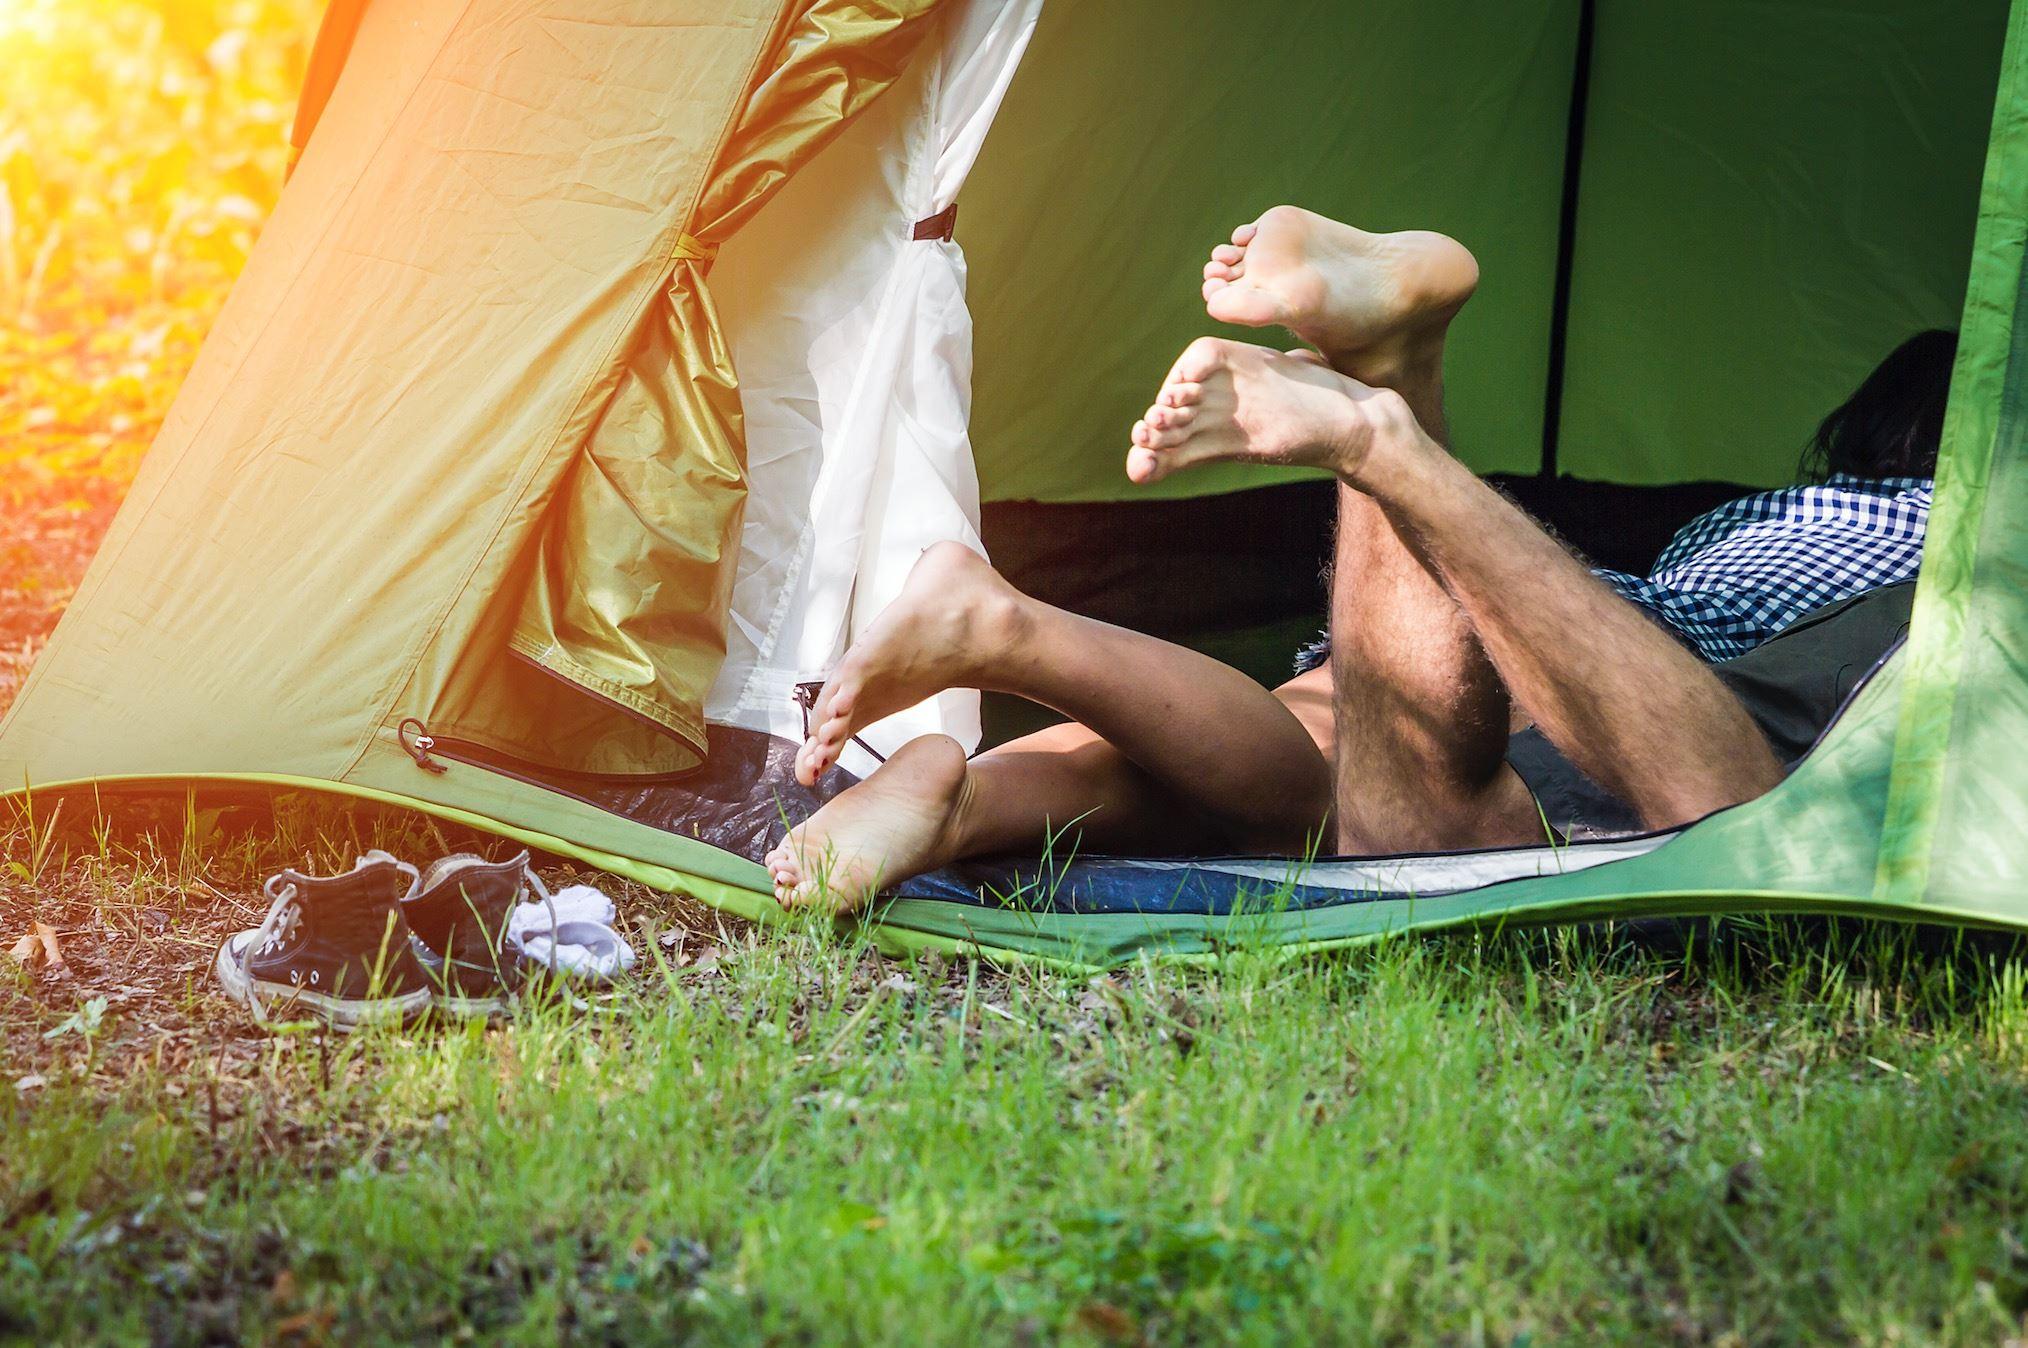 Kronocamping Böda Sandcamping Accommodation Details Camping öland